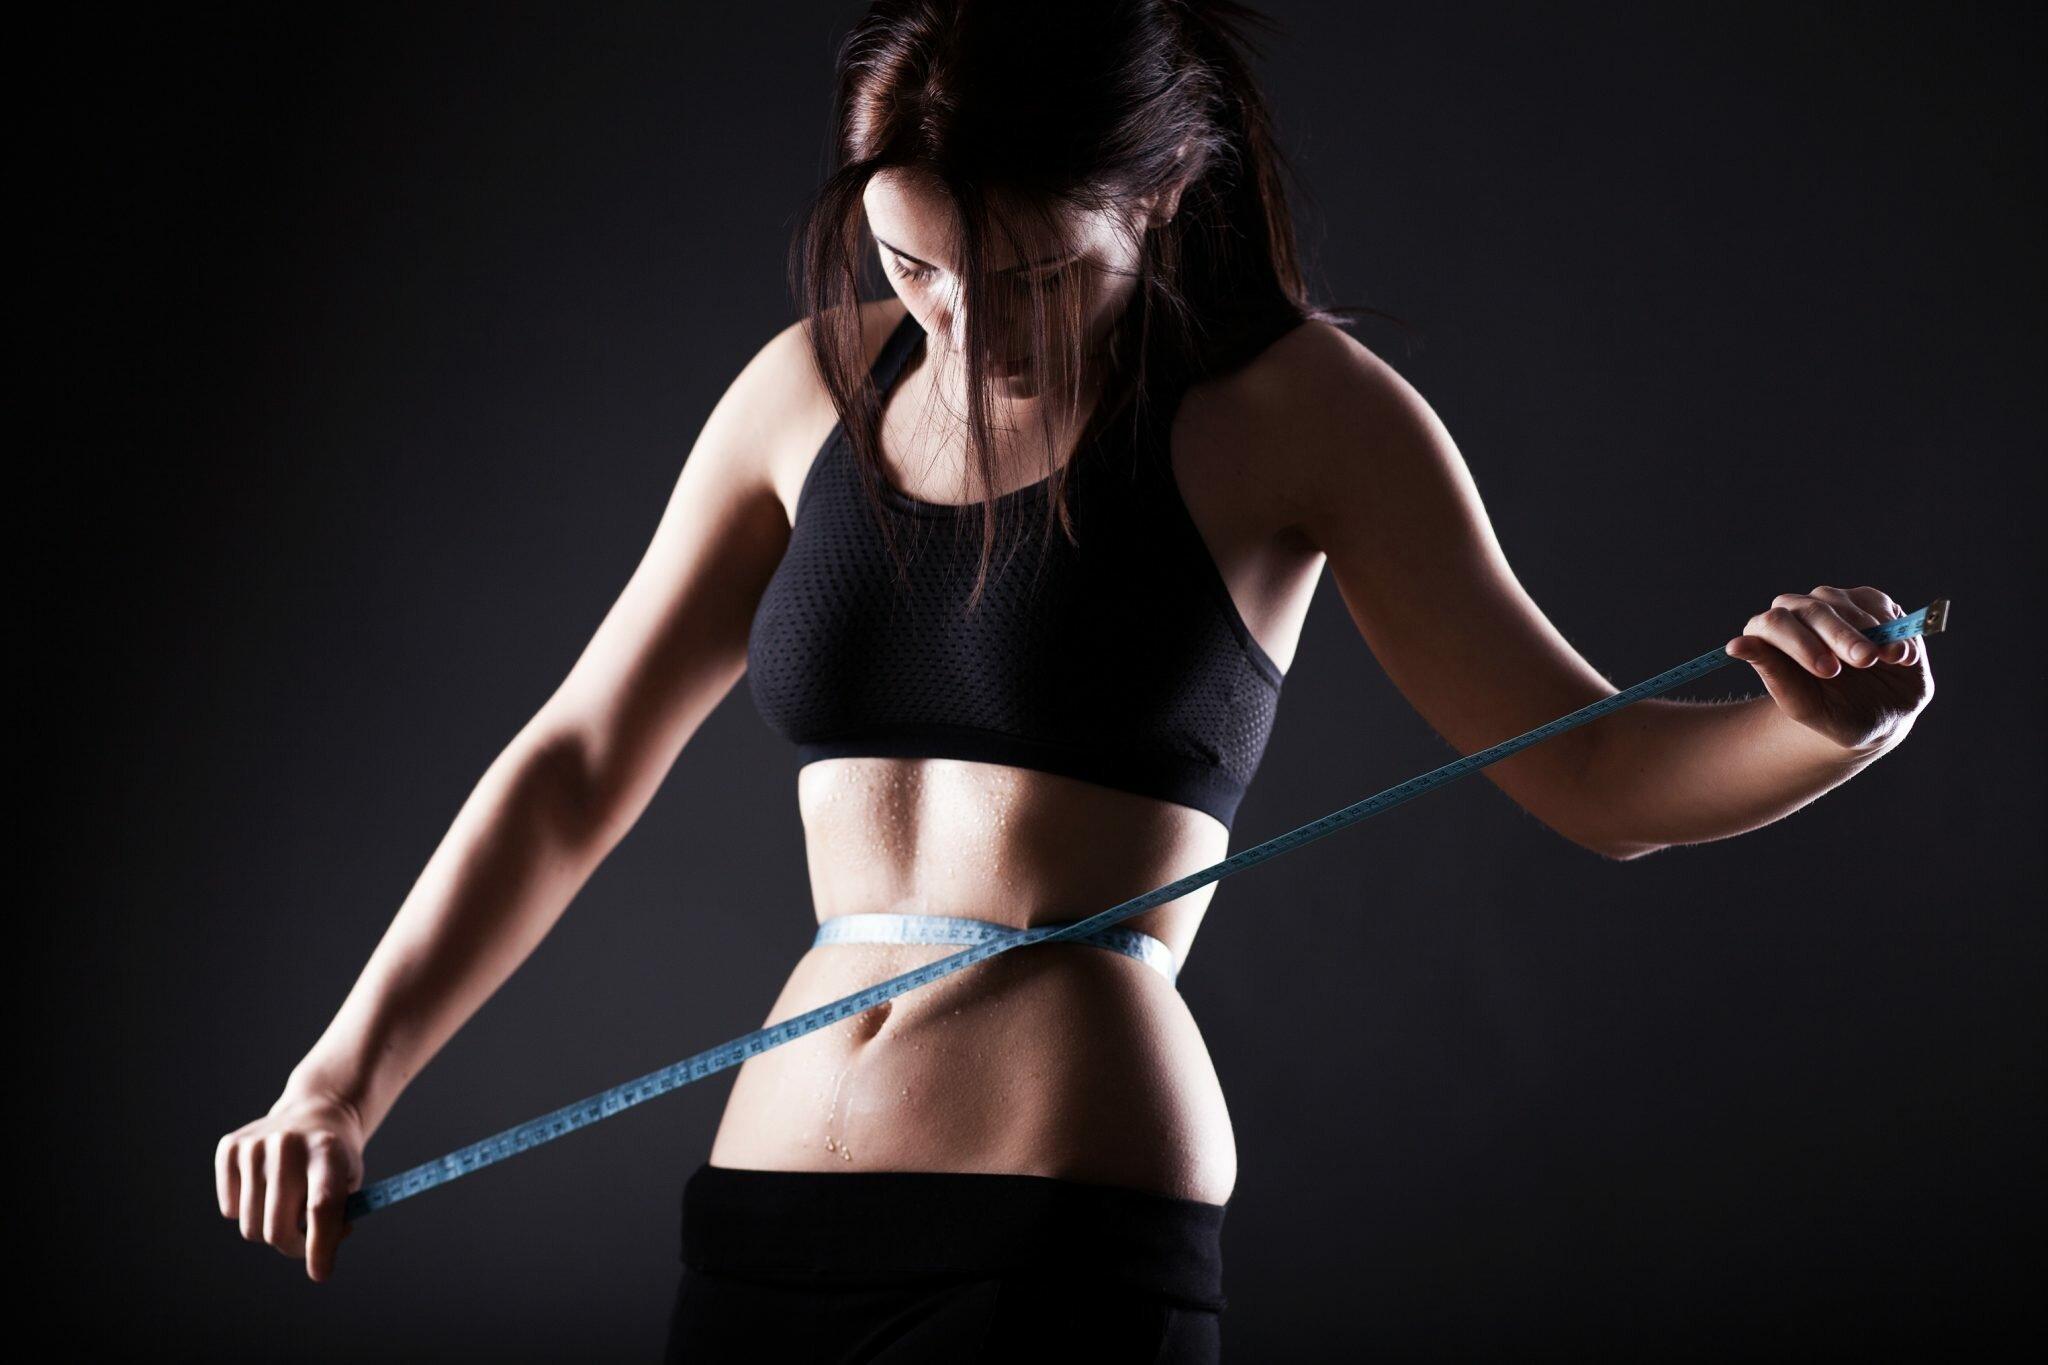 Хочу похудеть без усилий